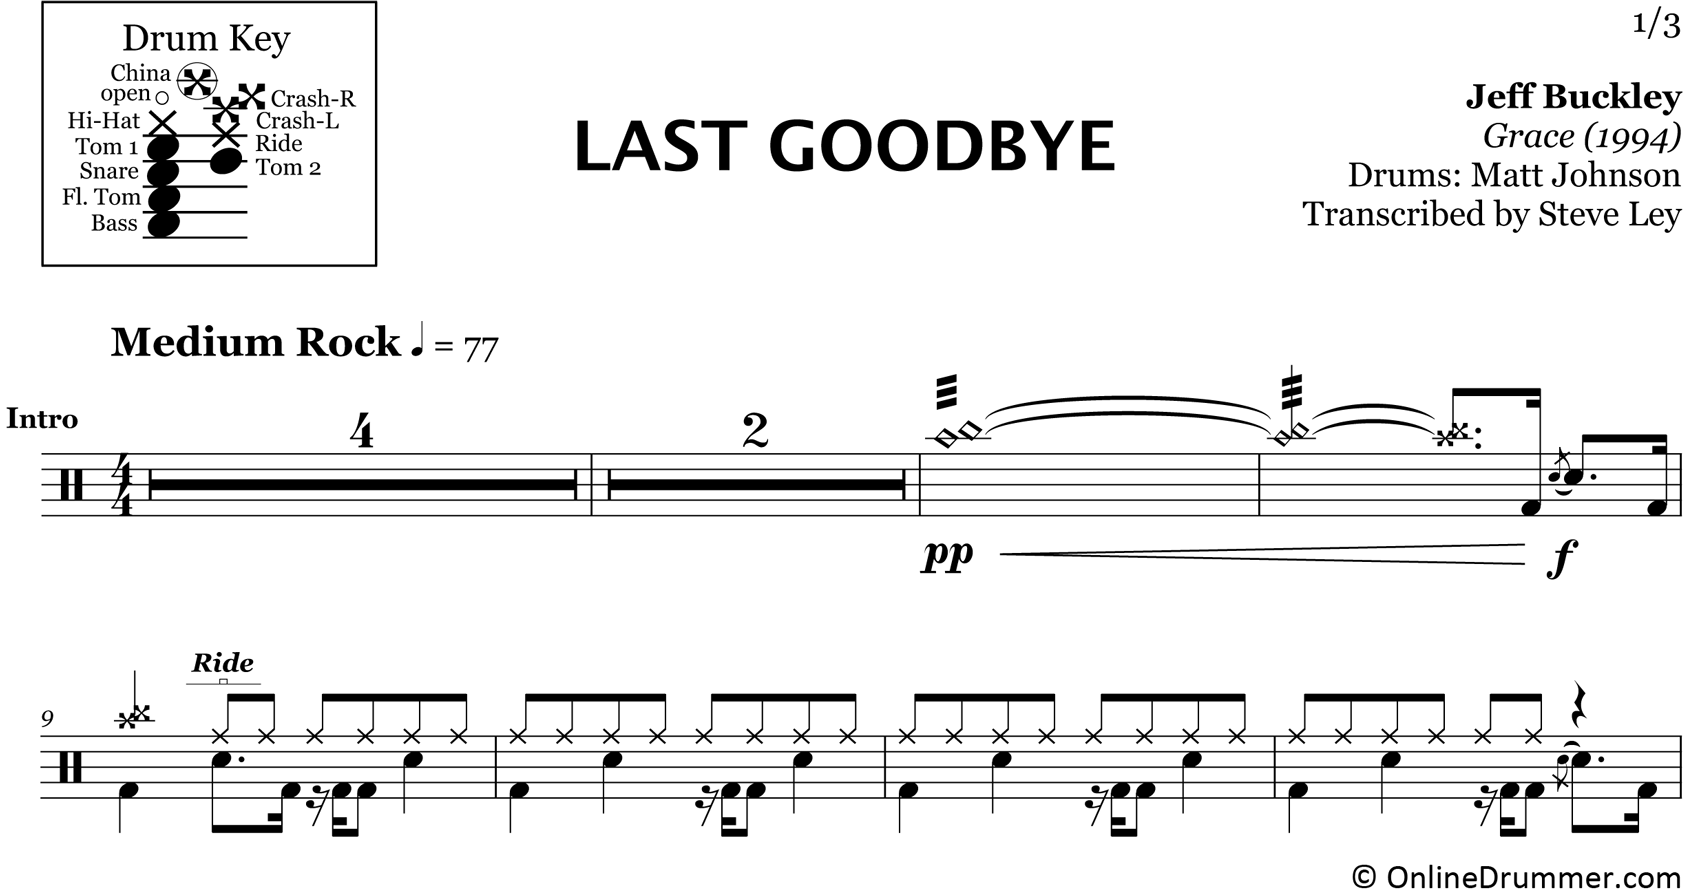 Last Goodbye - Jeff Buckley - Drum Sheet Music